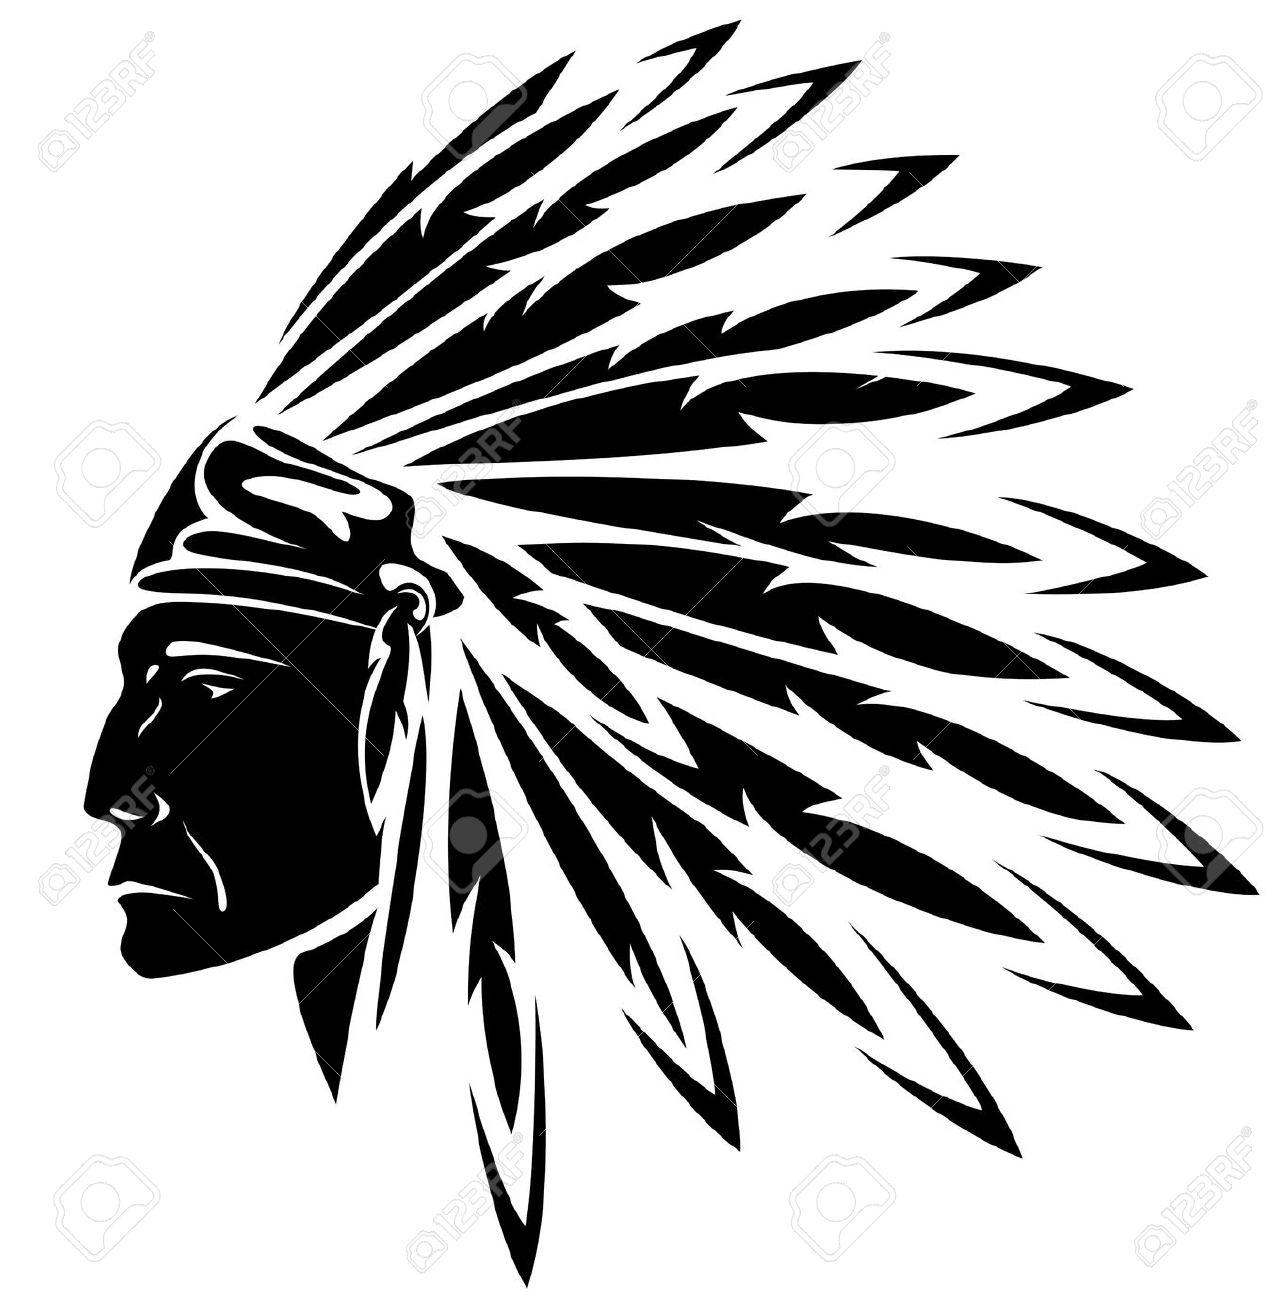 Indian Chief Headdress Clipart